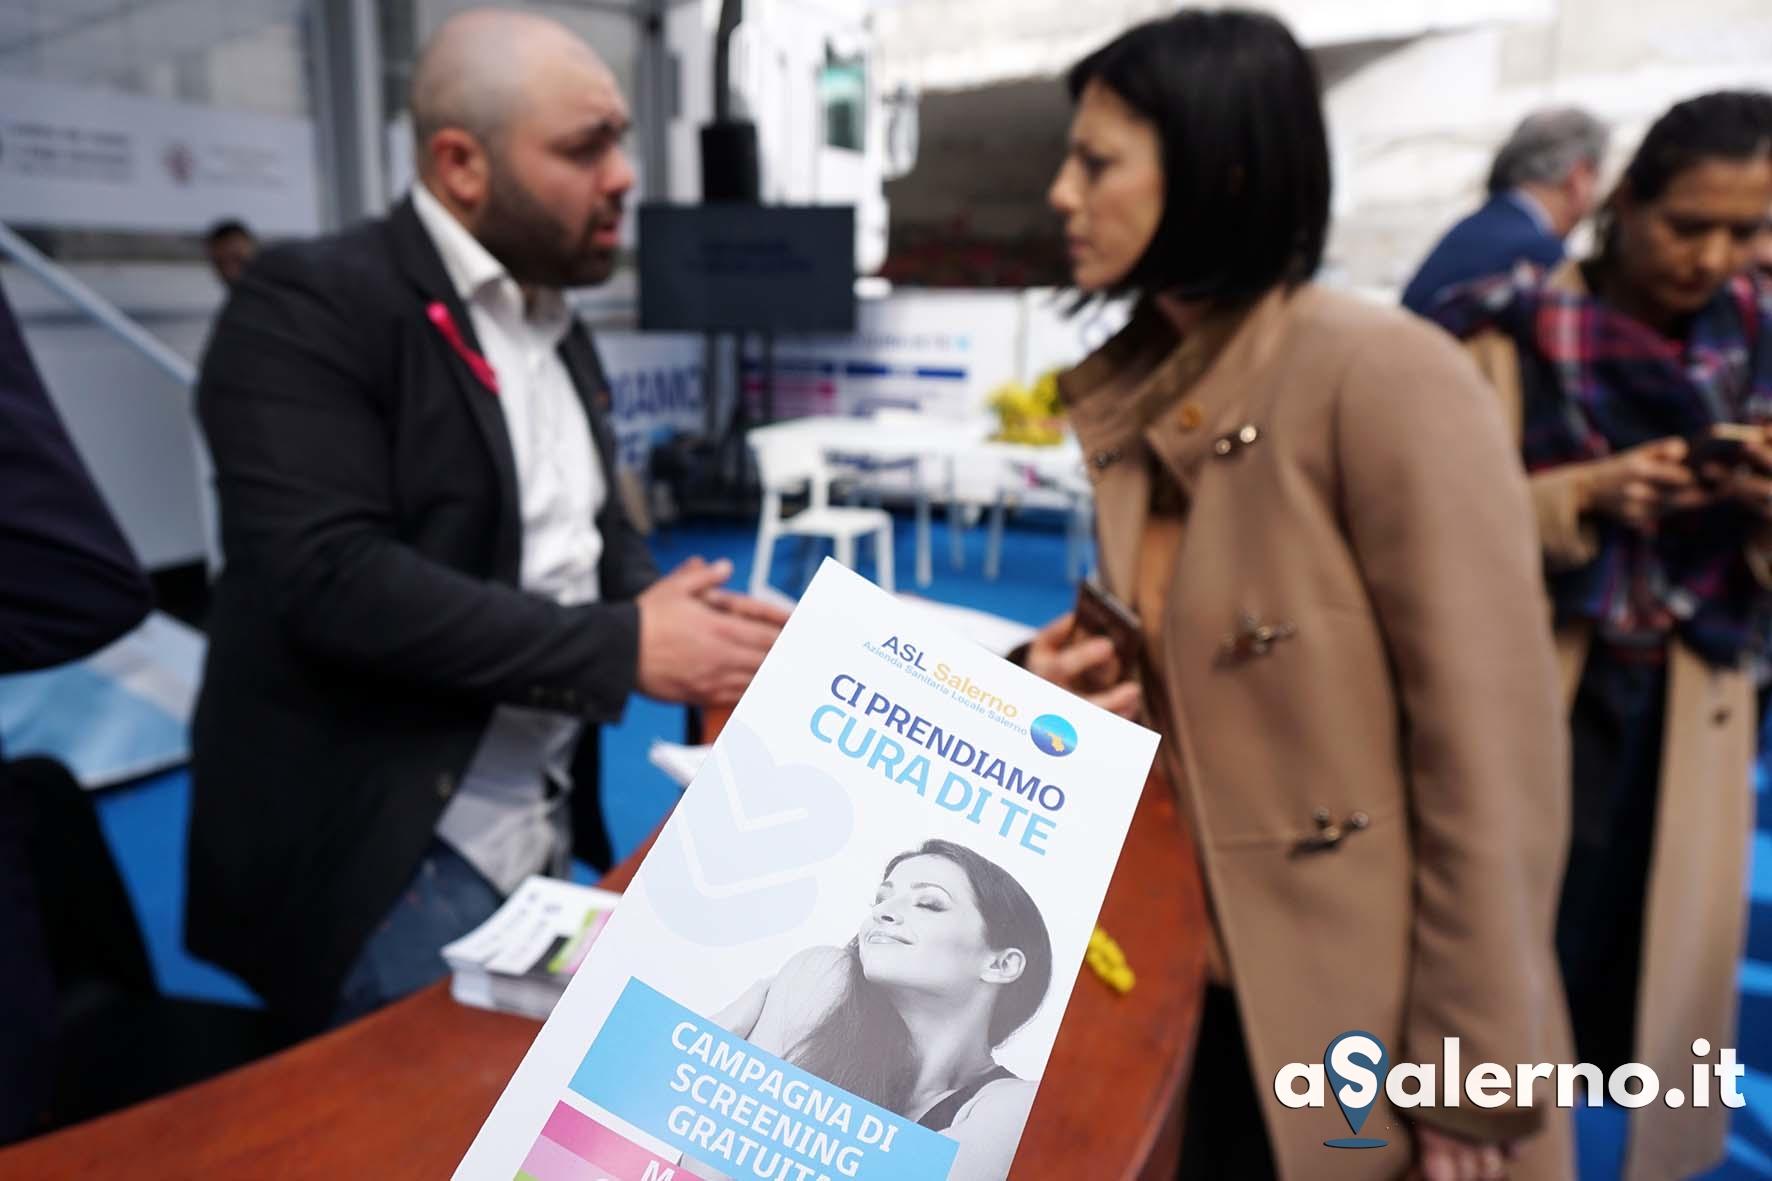 Sal - 08 03 2019 Salerno. Visite gratuite ASL piazza Casalbore. foto Tanopress